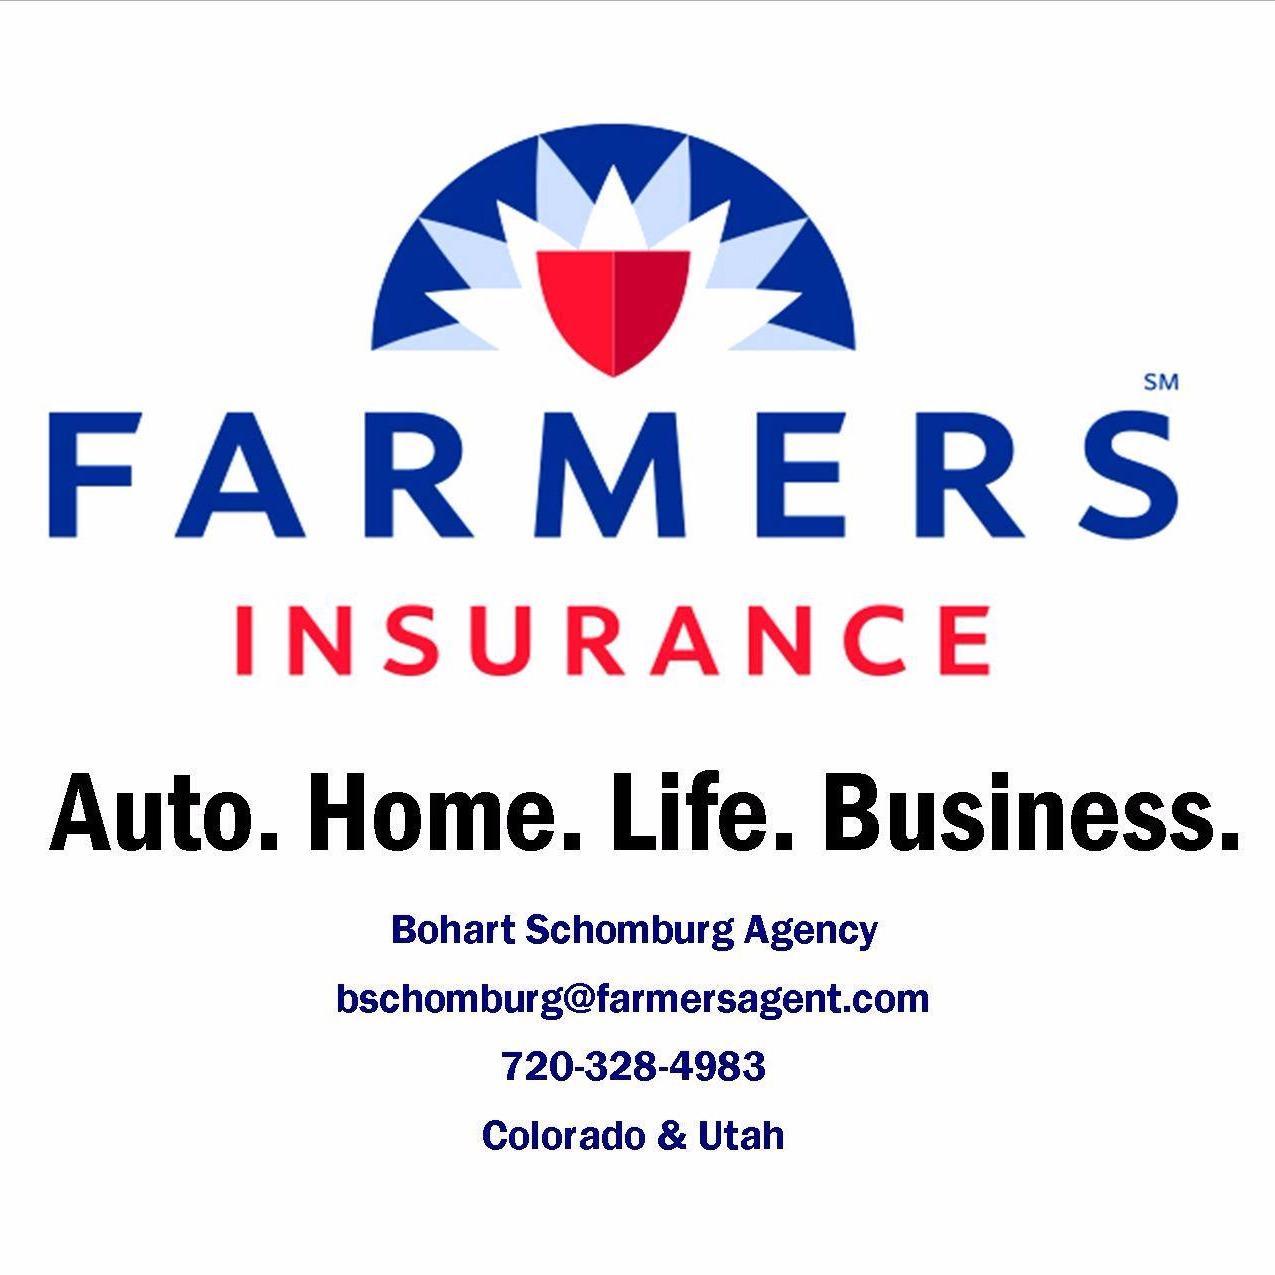 Farmers Insurance Group: Schomburg Bohart